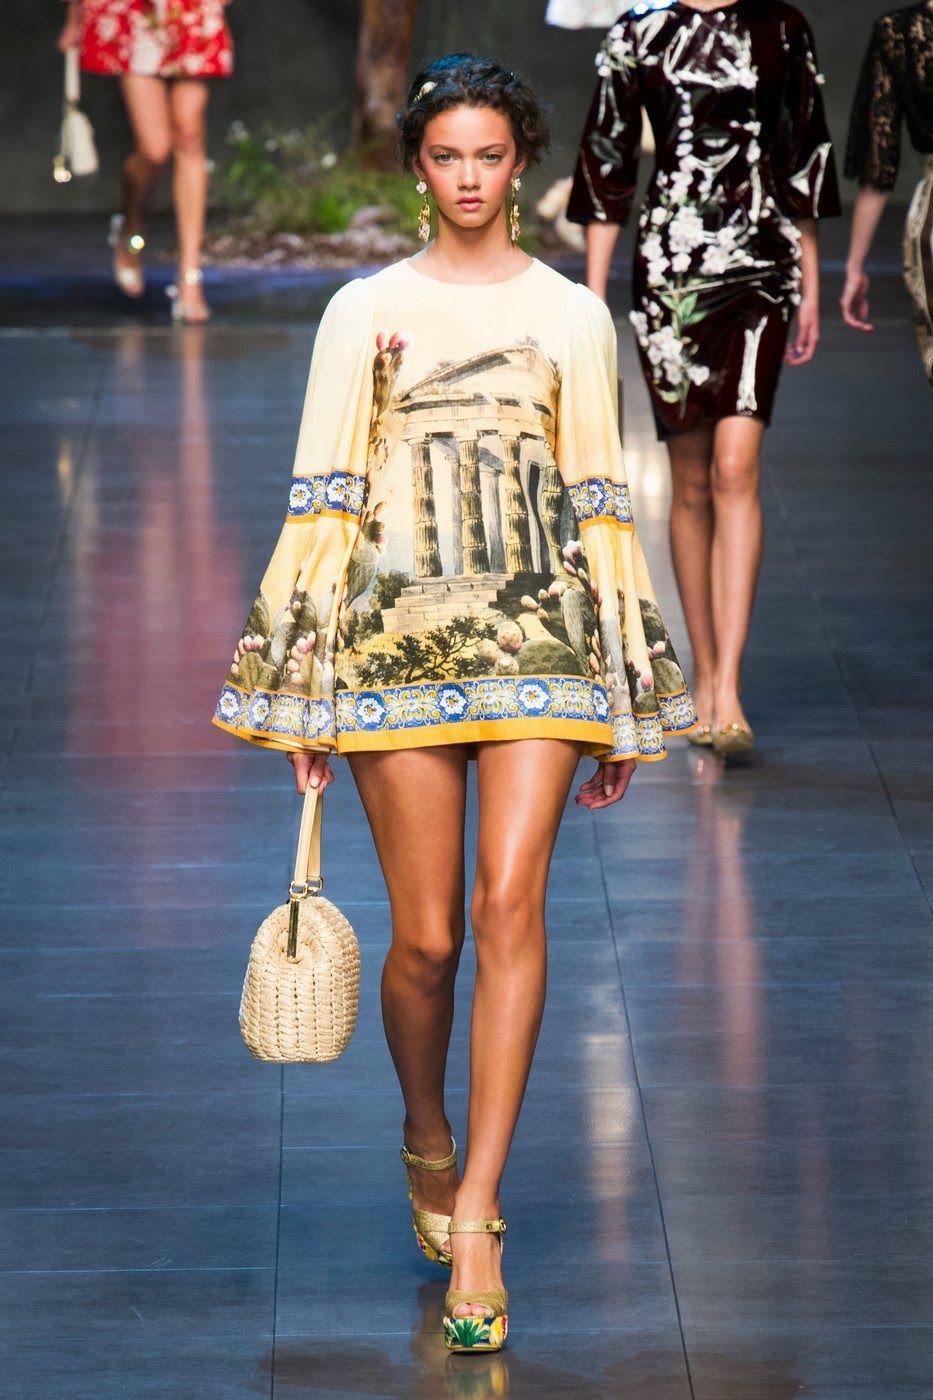 Striped Slip On Spring/summerDolce & Gabbana n2fAy